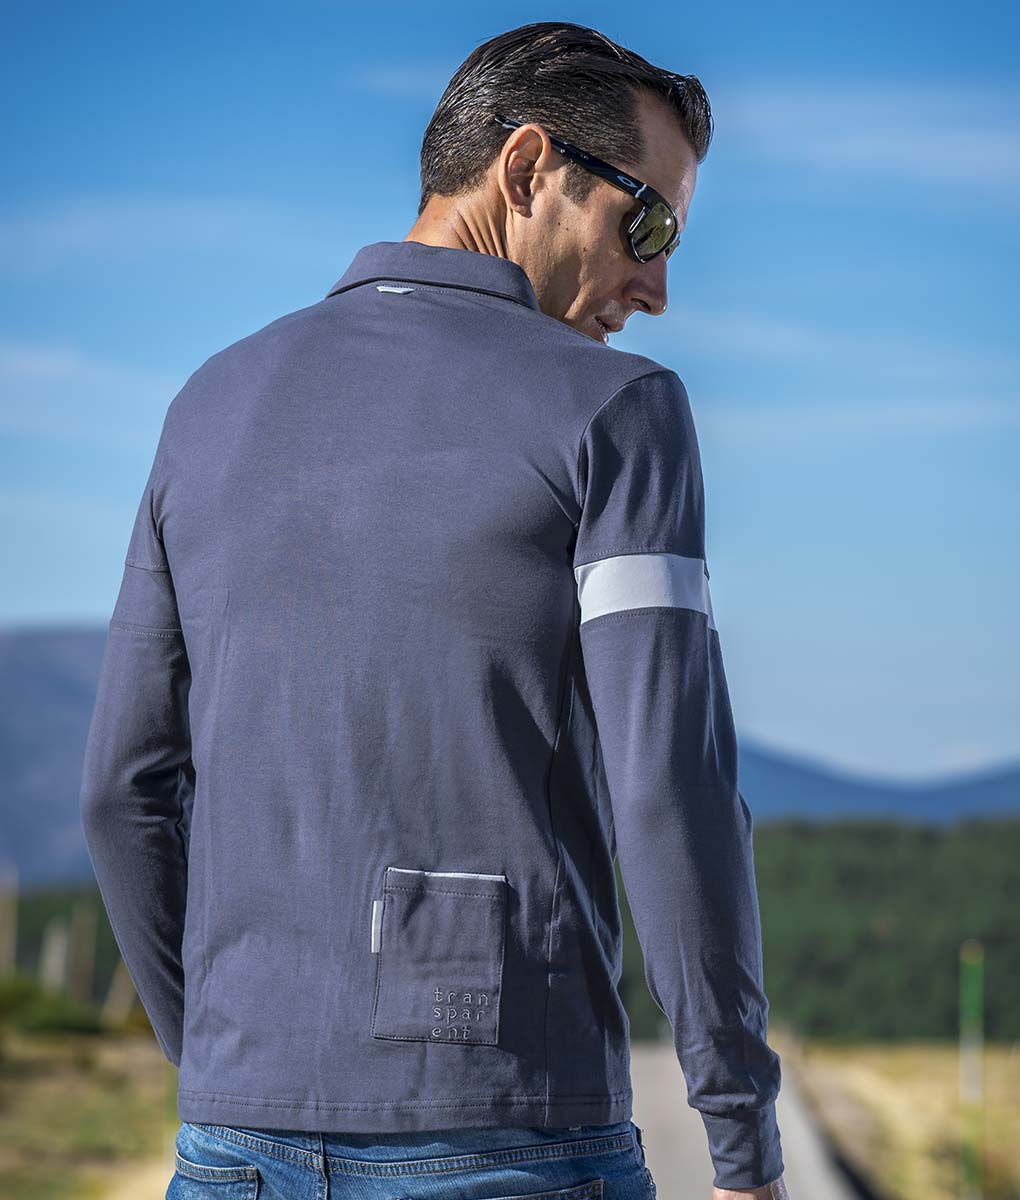 Transparent-casual-cycling-titanium-classic-exterior-back